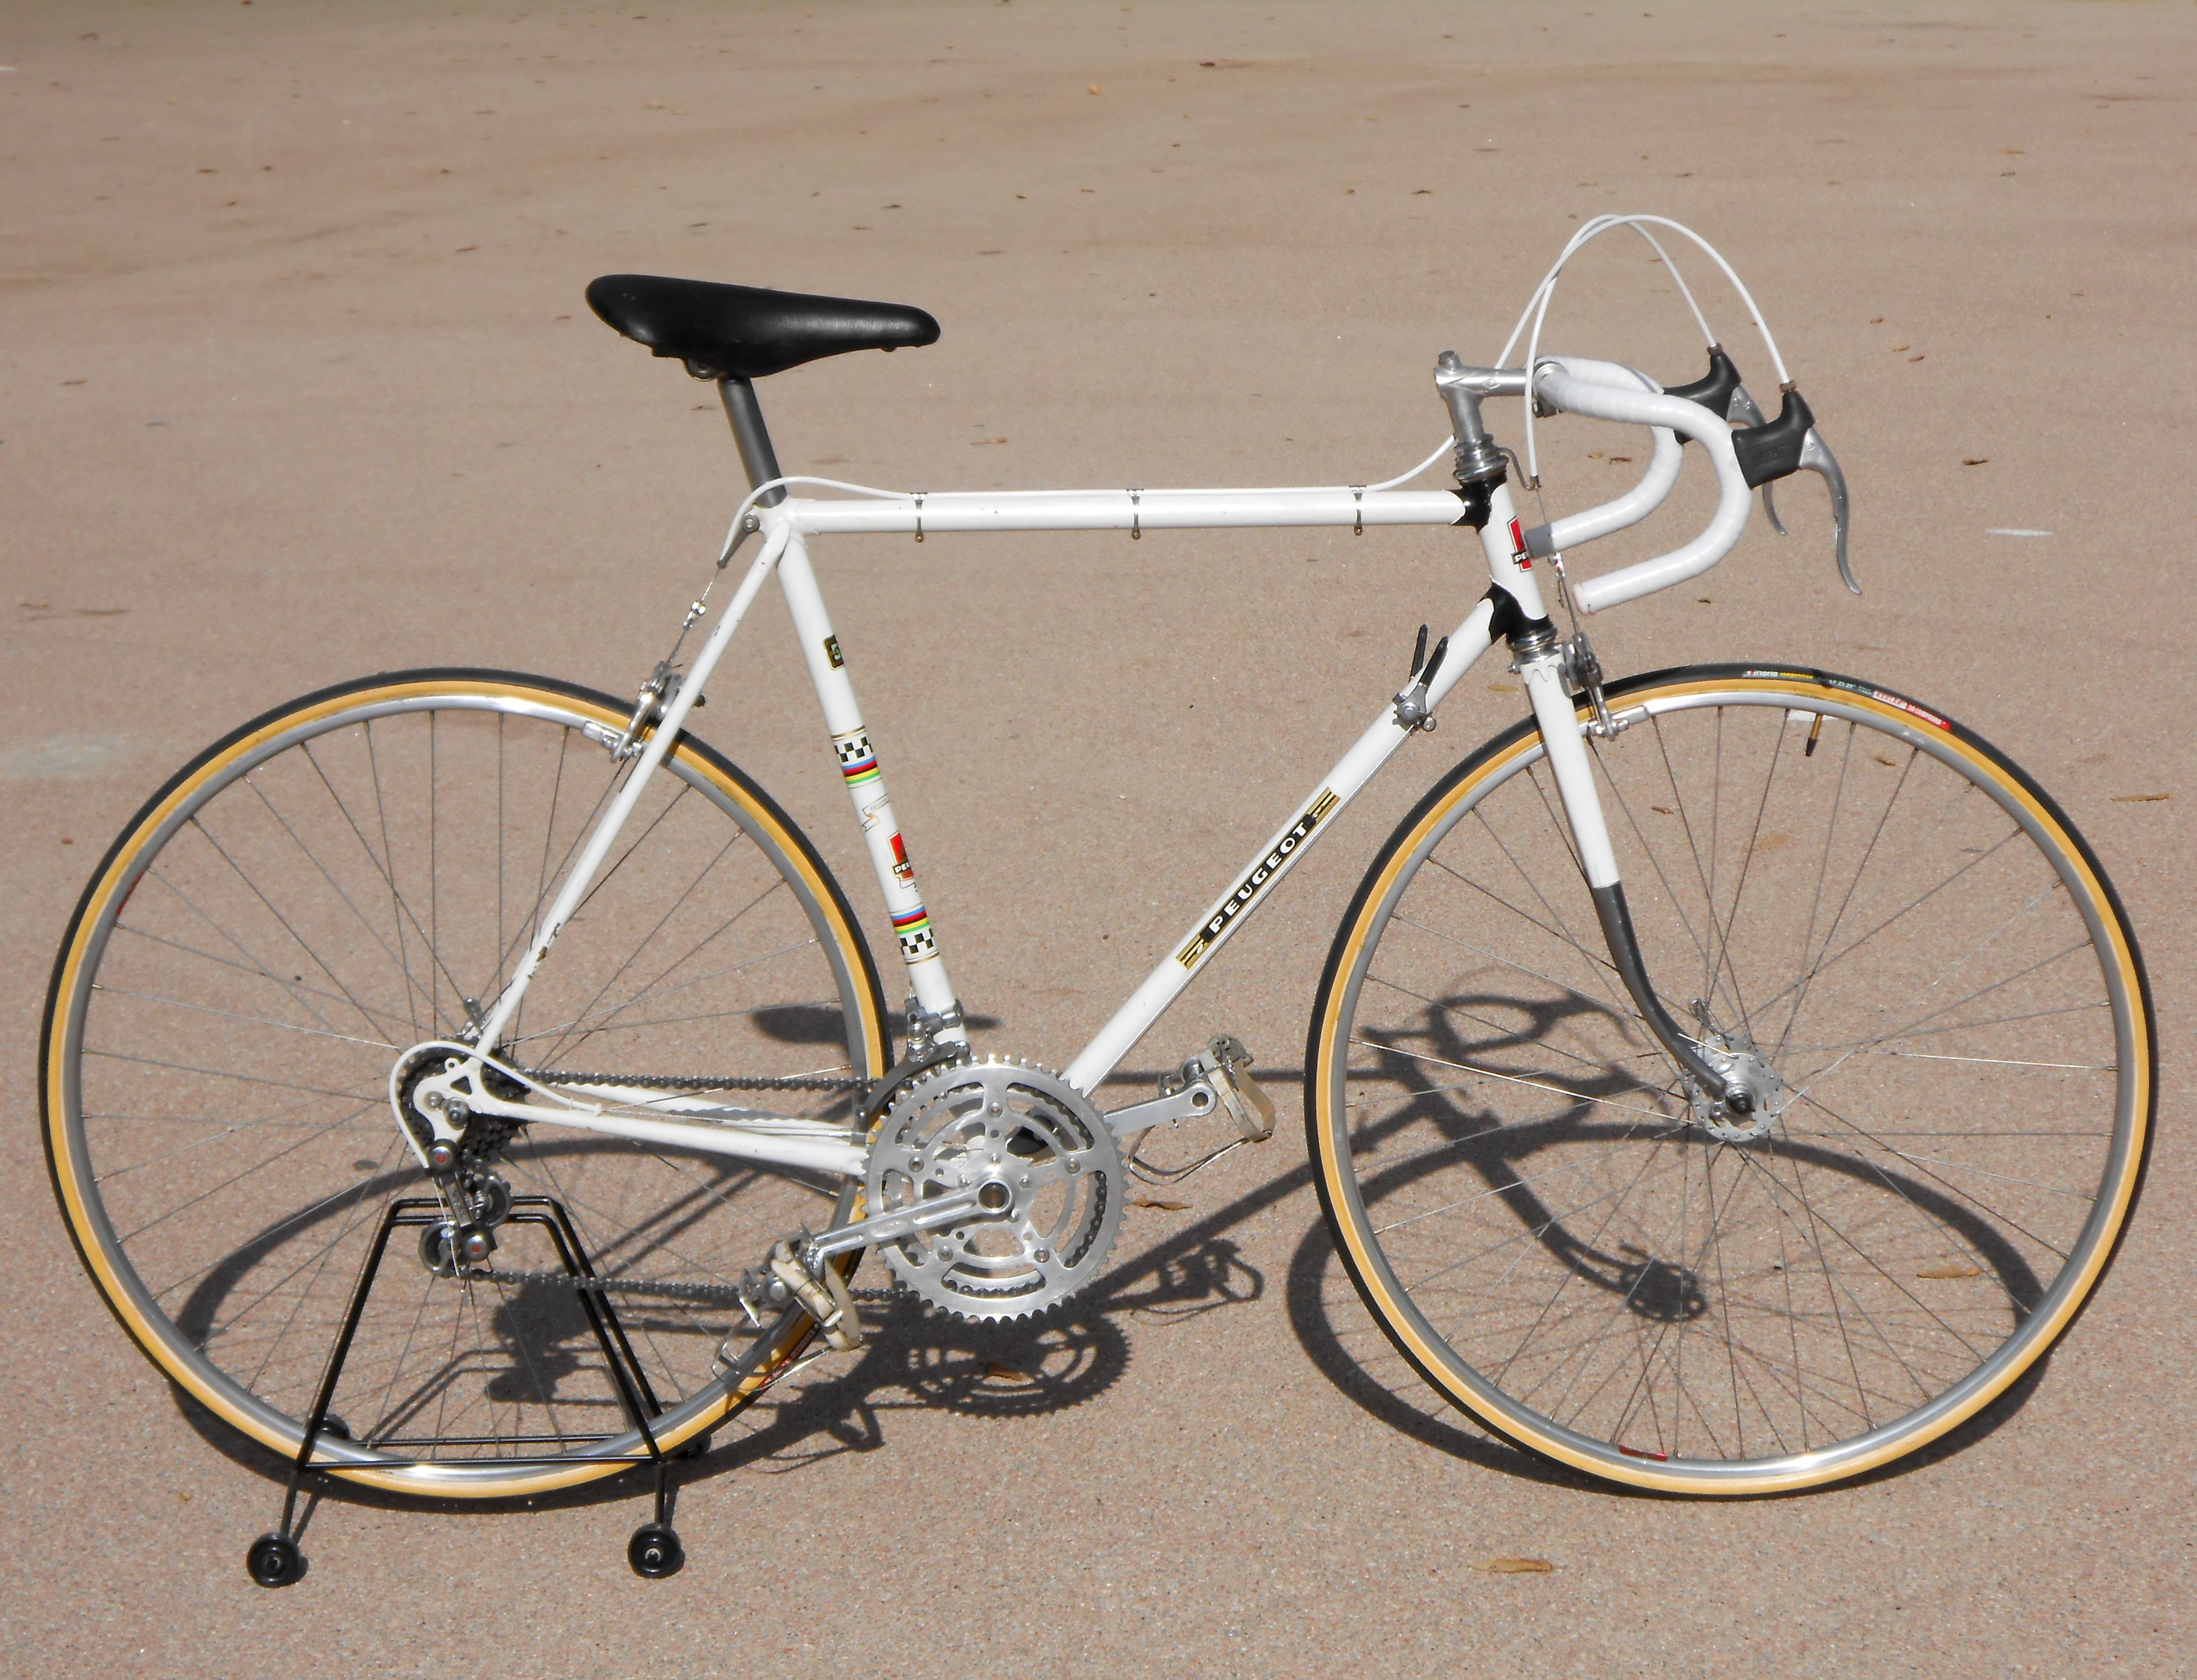 Peugeot Px10 Reynolds 531 Tubing Año 1975 Bike Riding Benefits Bicycle Road Bike Cycling